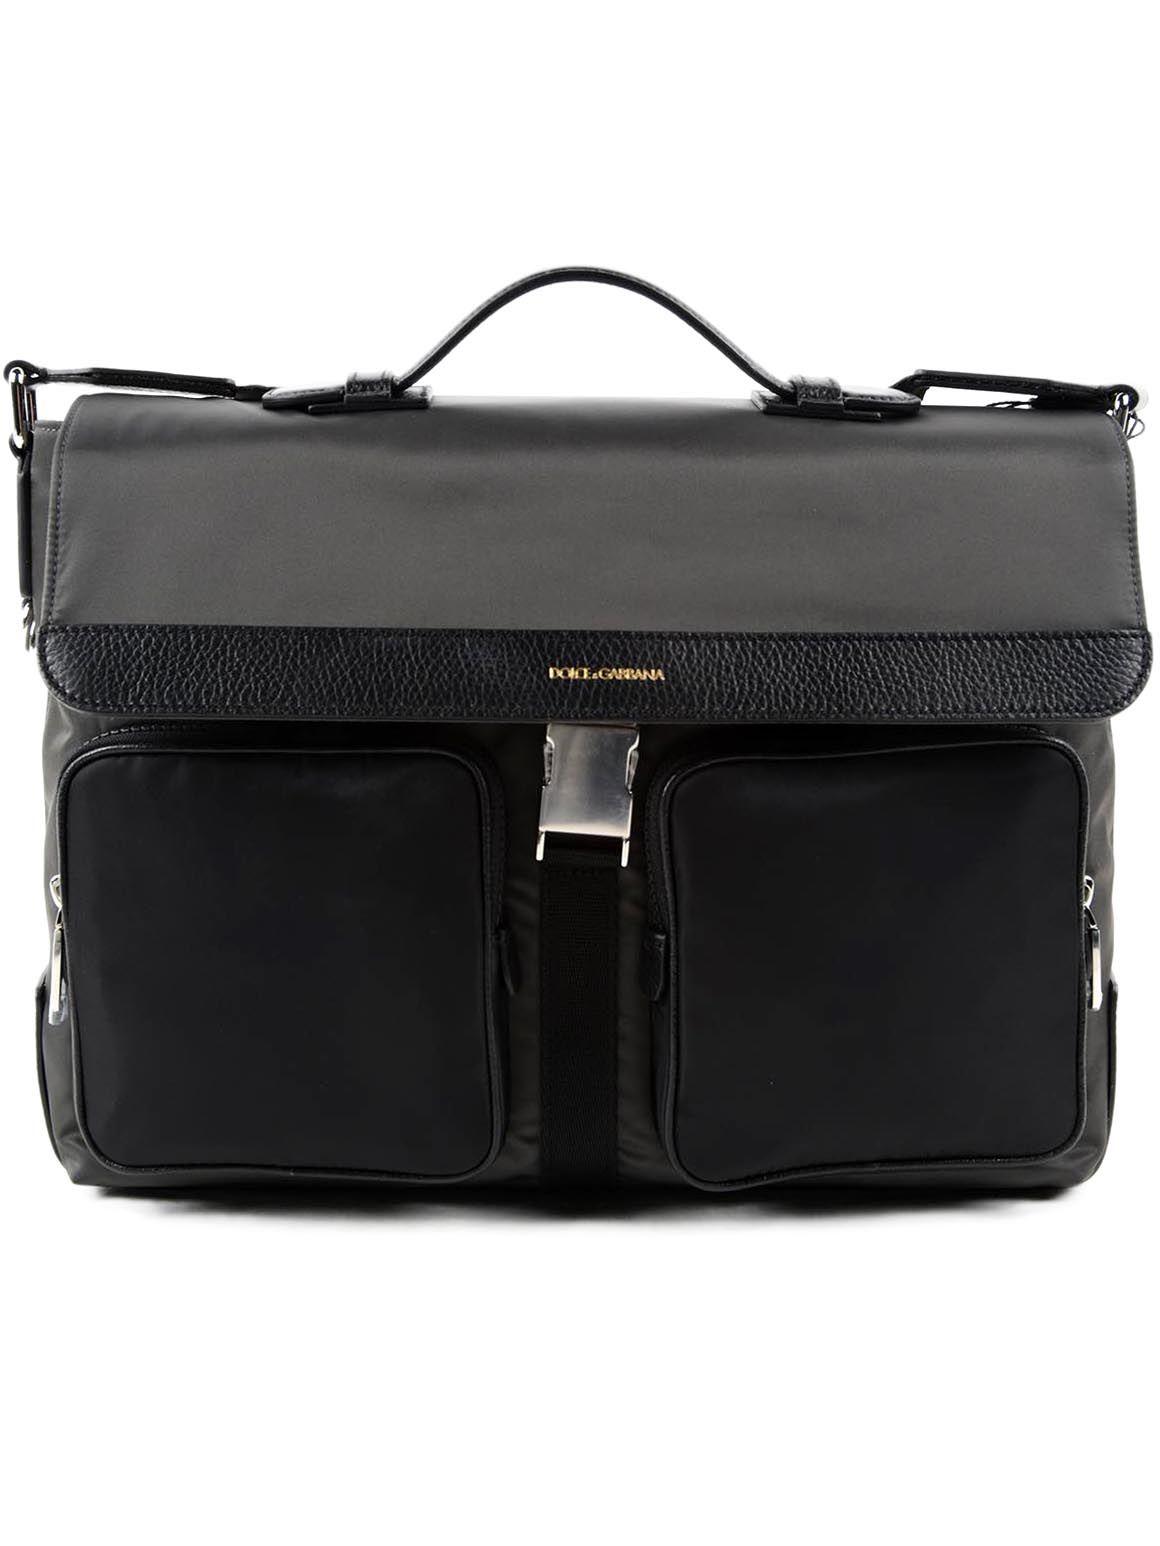 Dolce & Gabbana Dolce & Gabbana Flap Messenger Bag